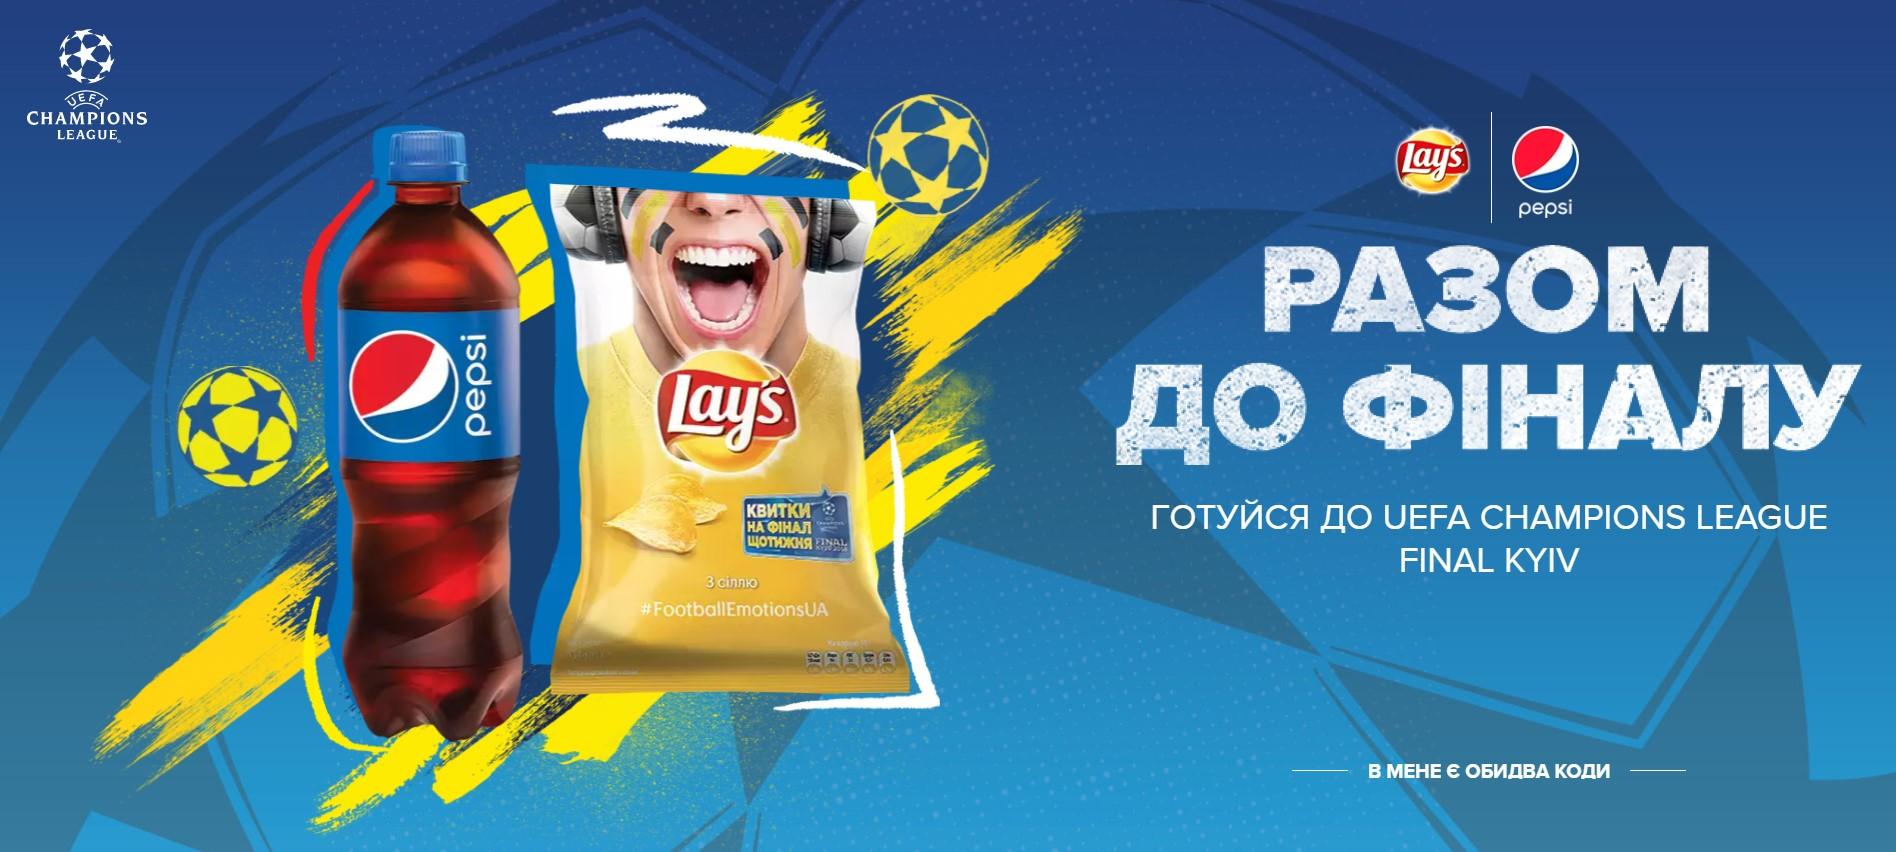 Akciya-Leis-i-Pepsi-Vmeste-k-finalu-Ligi-chempionov-UEFA-2018-wintogether.com_.ua_1